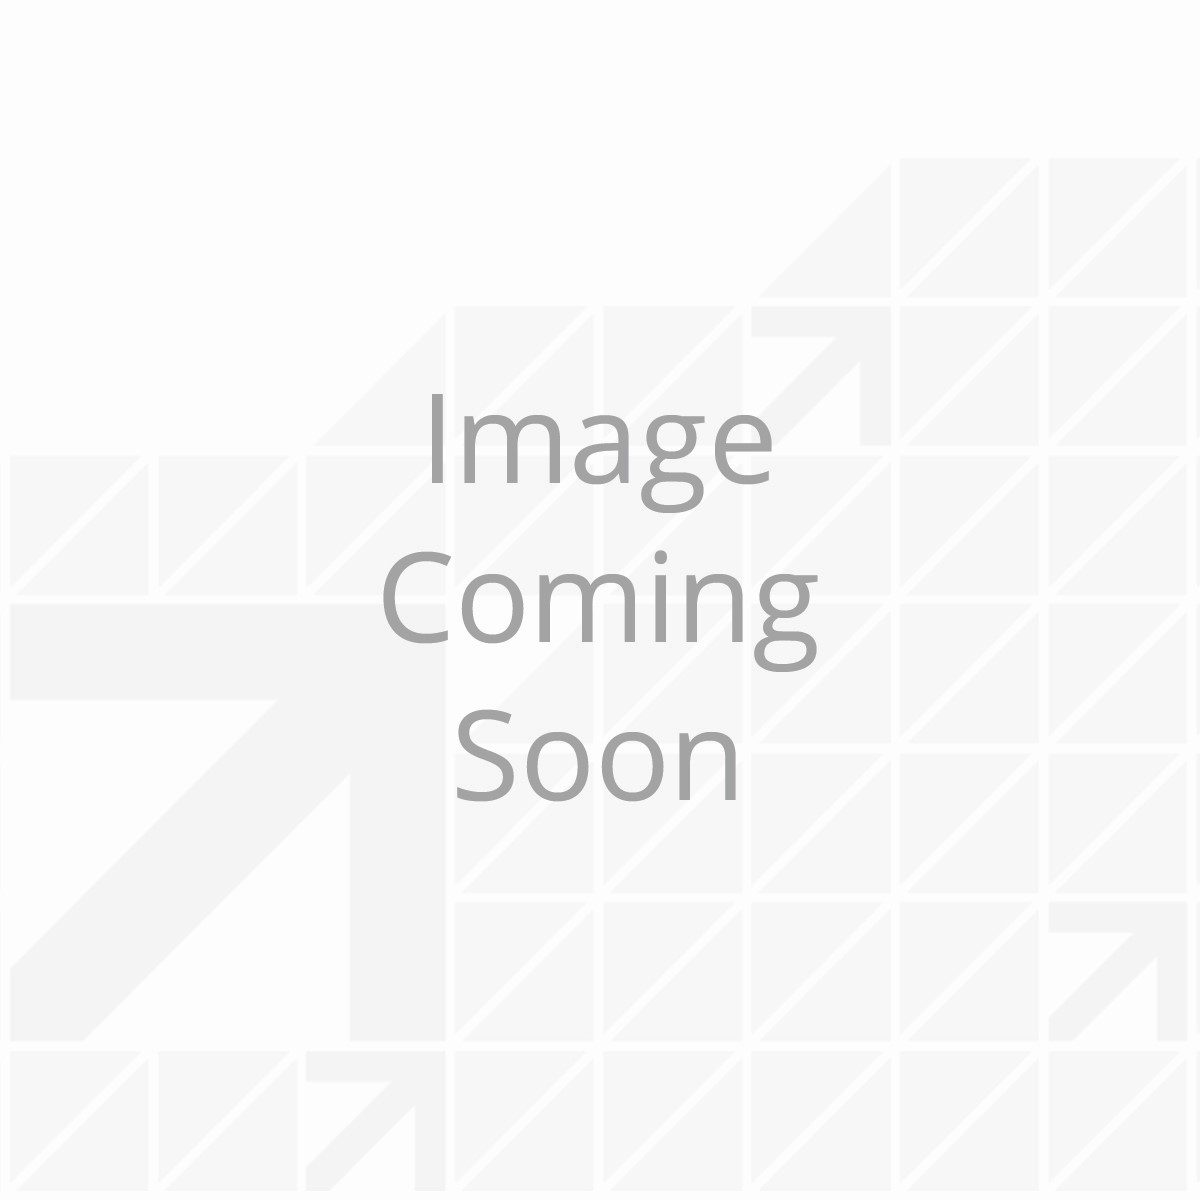 Swivel Glider Recliner in Grantland Doeskin